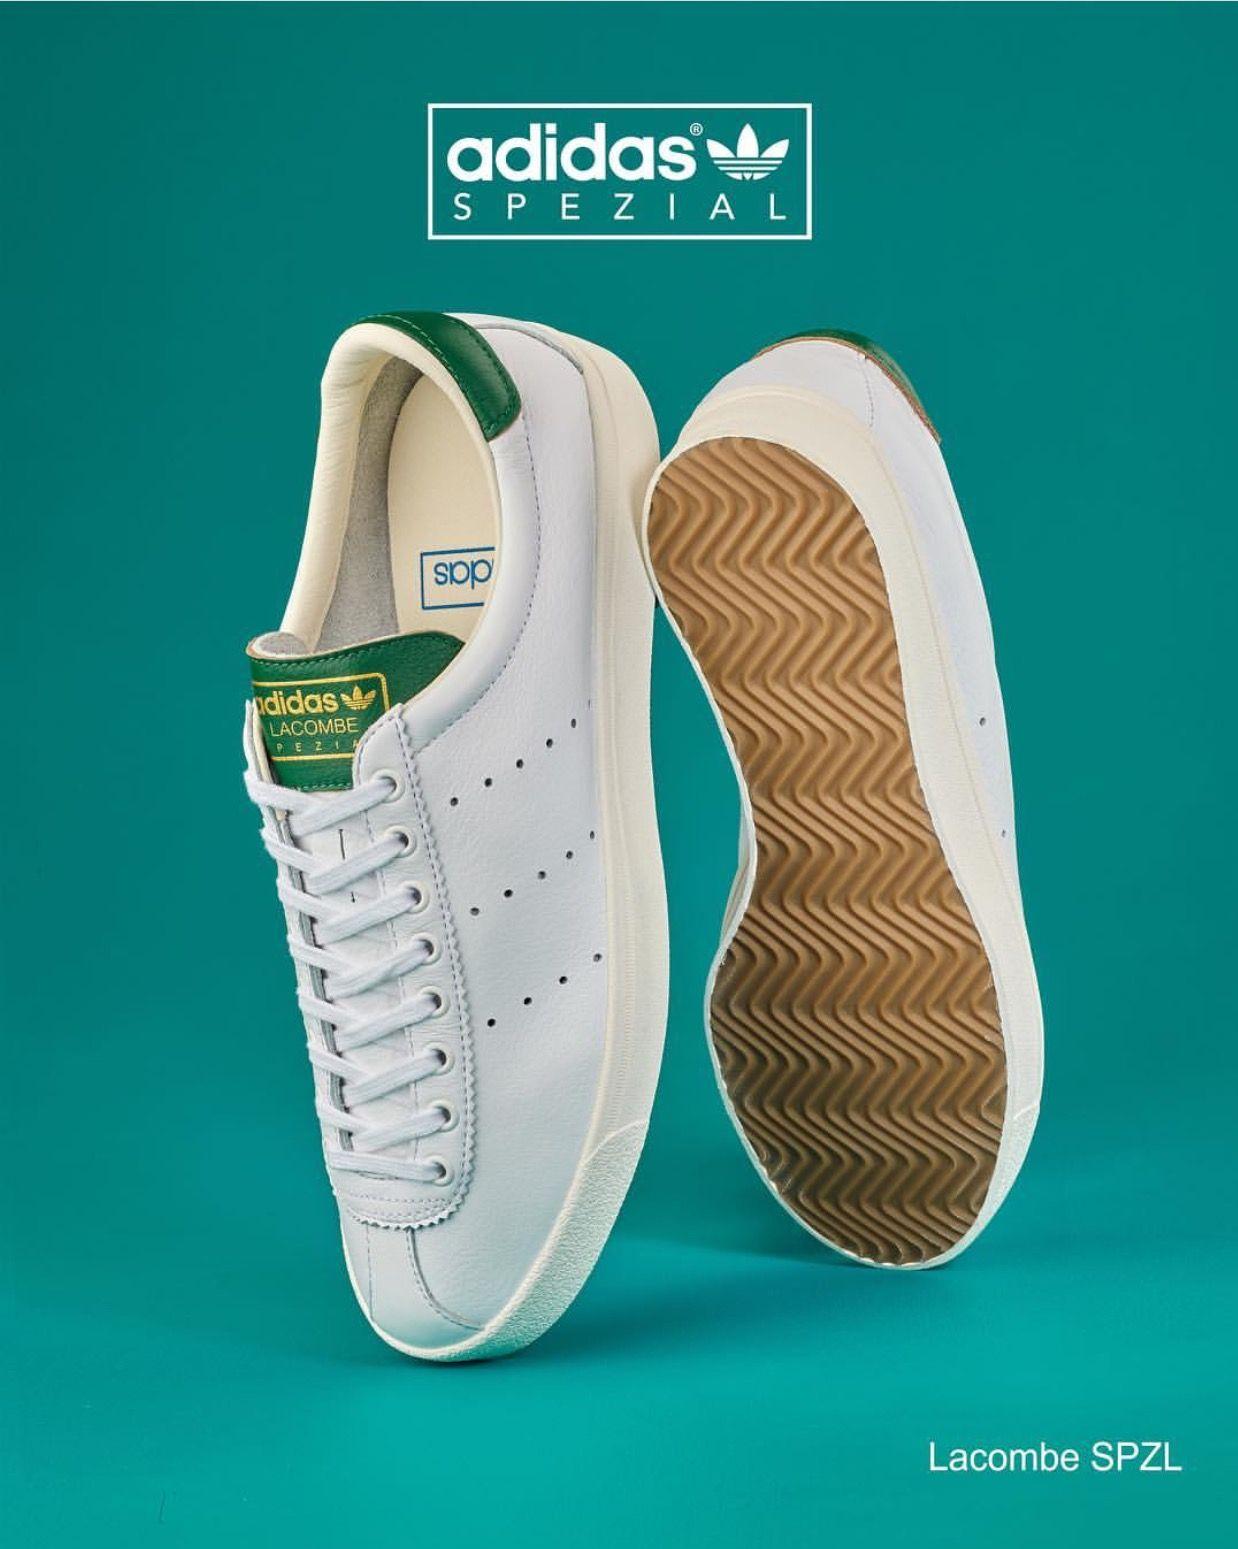 newest 22381 c9931 Lacombe SPZL Retro Sneakers, Classic Sneakers, Adidas Classic Shoes, Shoes  Sneakers, Sneakers